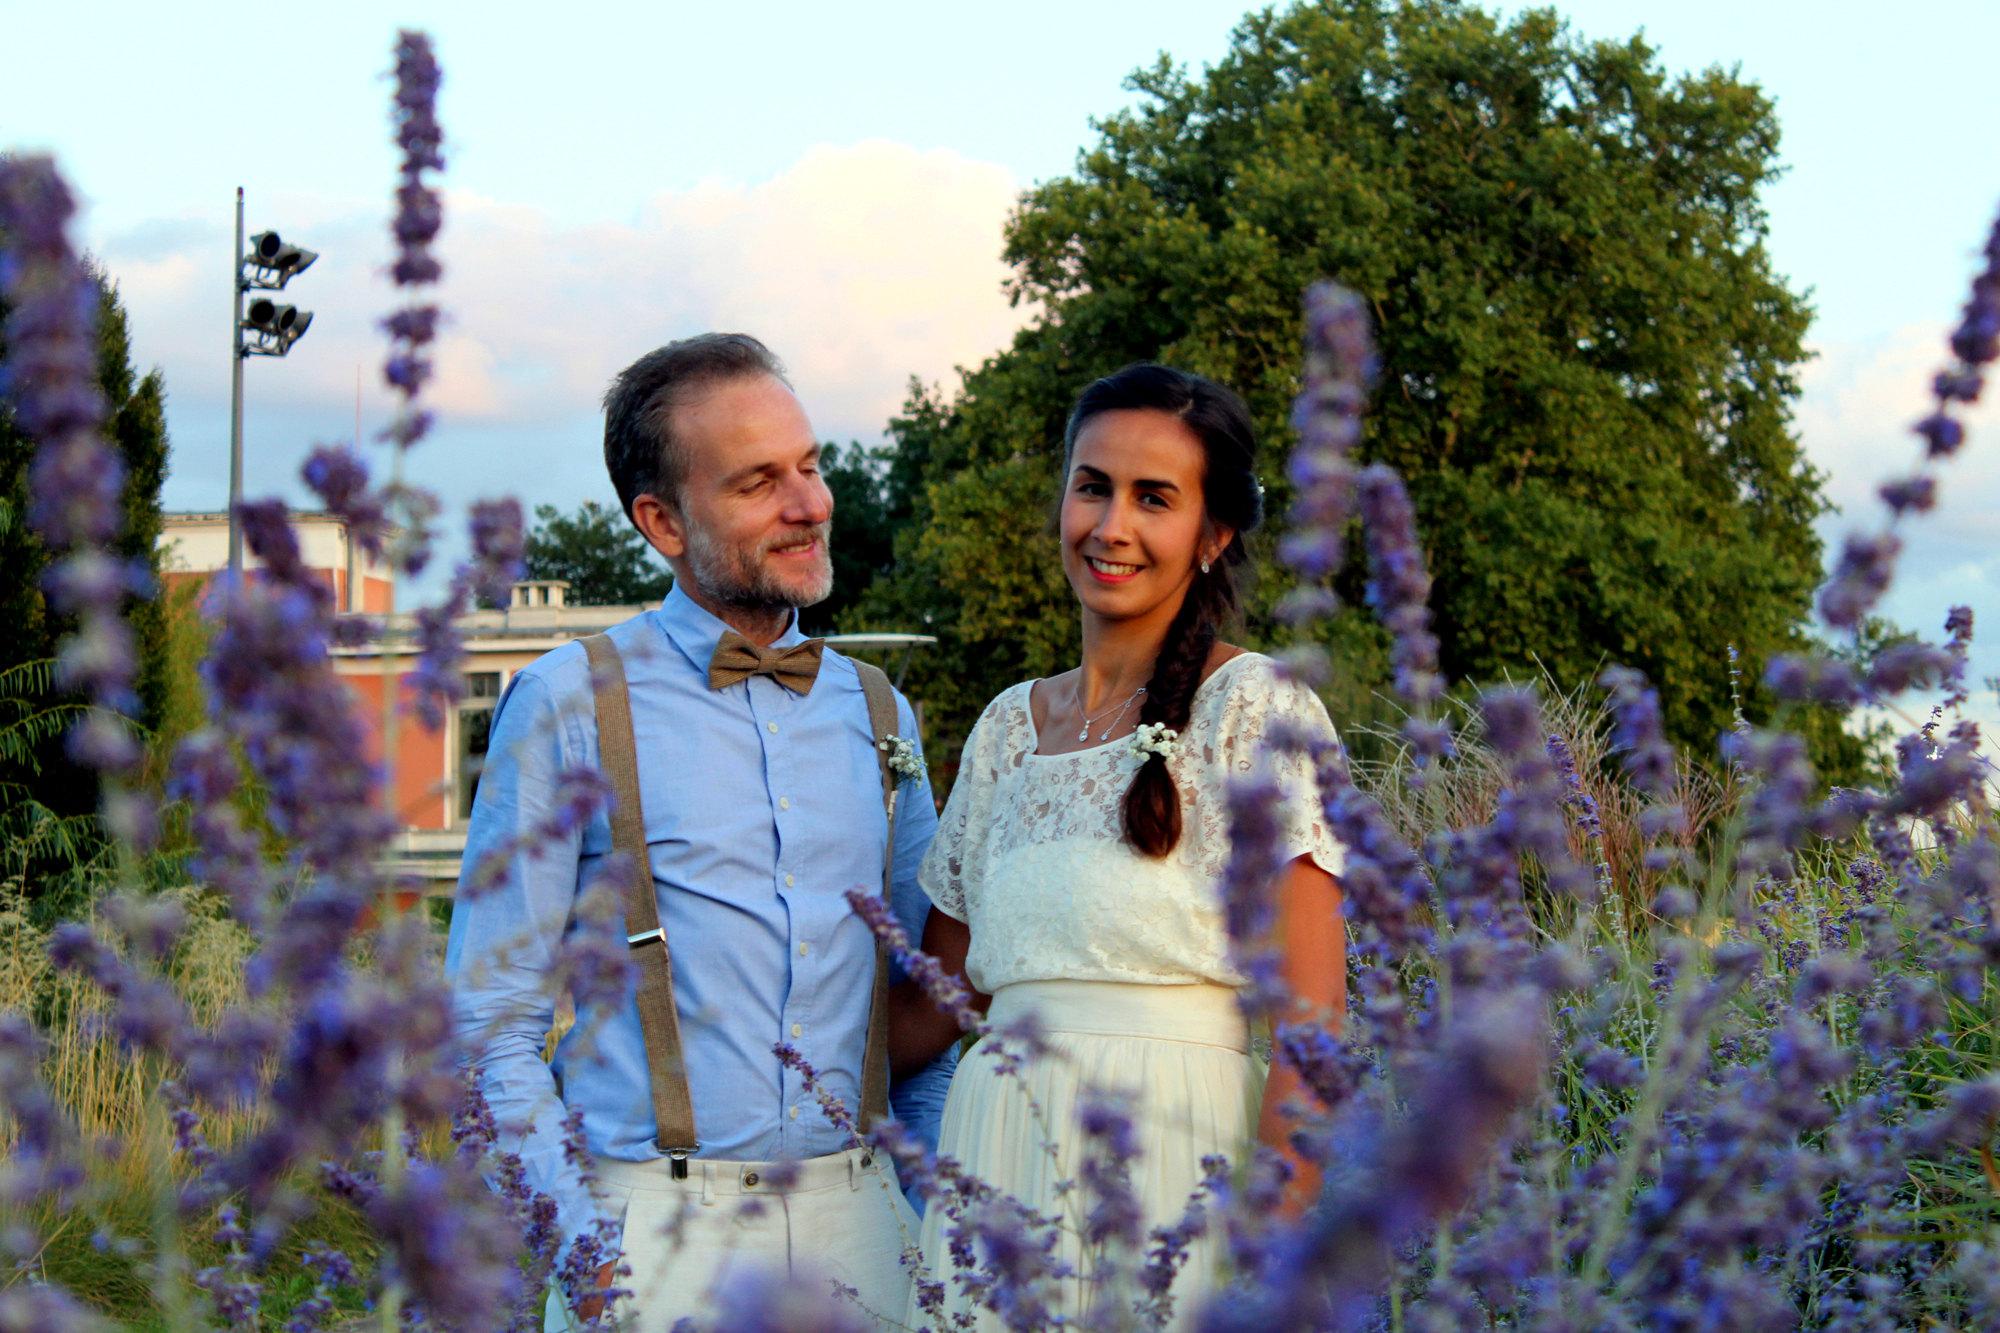 Nadia's simple outdoors wedding ~ Larimeloom bridal separates